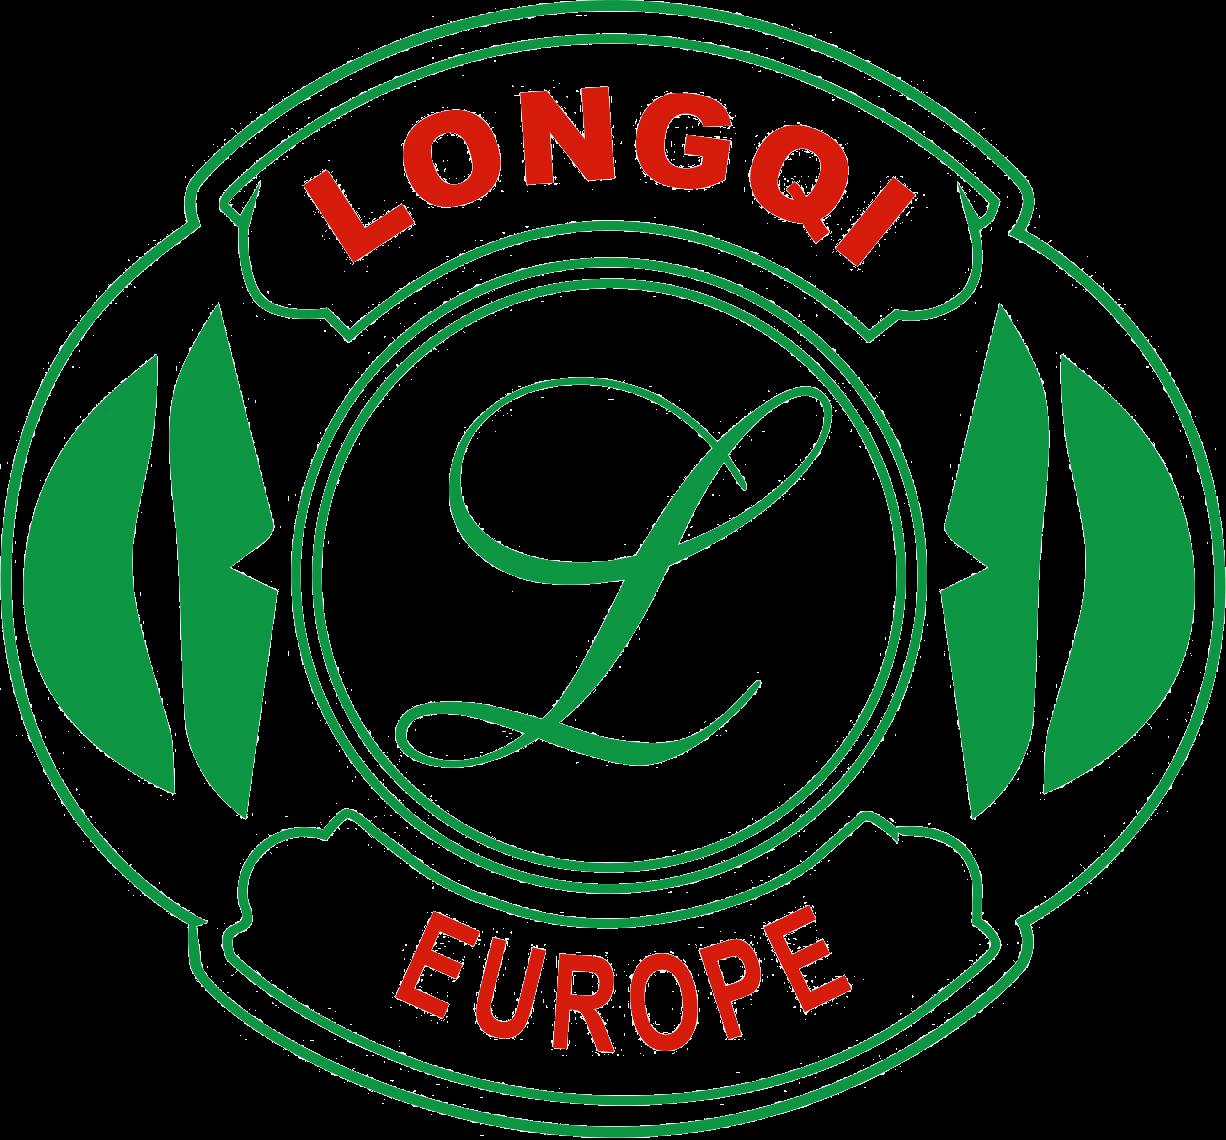 LONGQI EUROPE